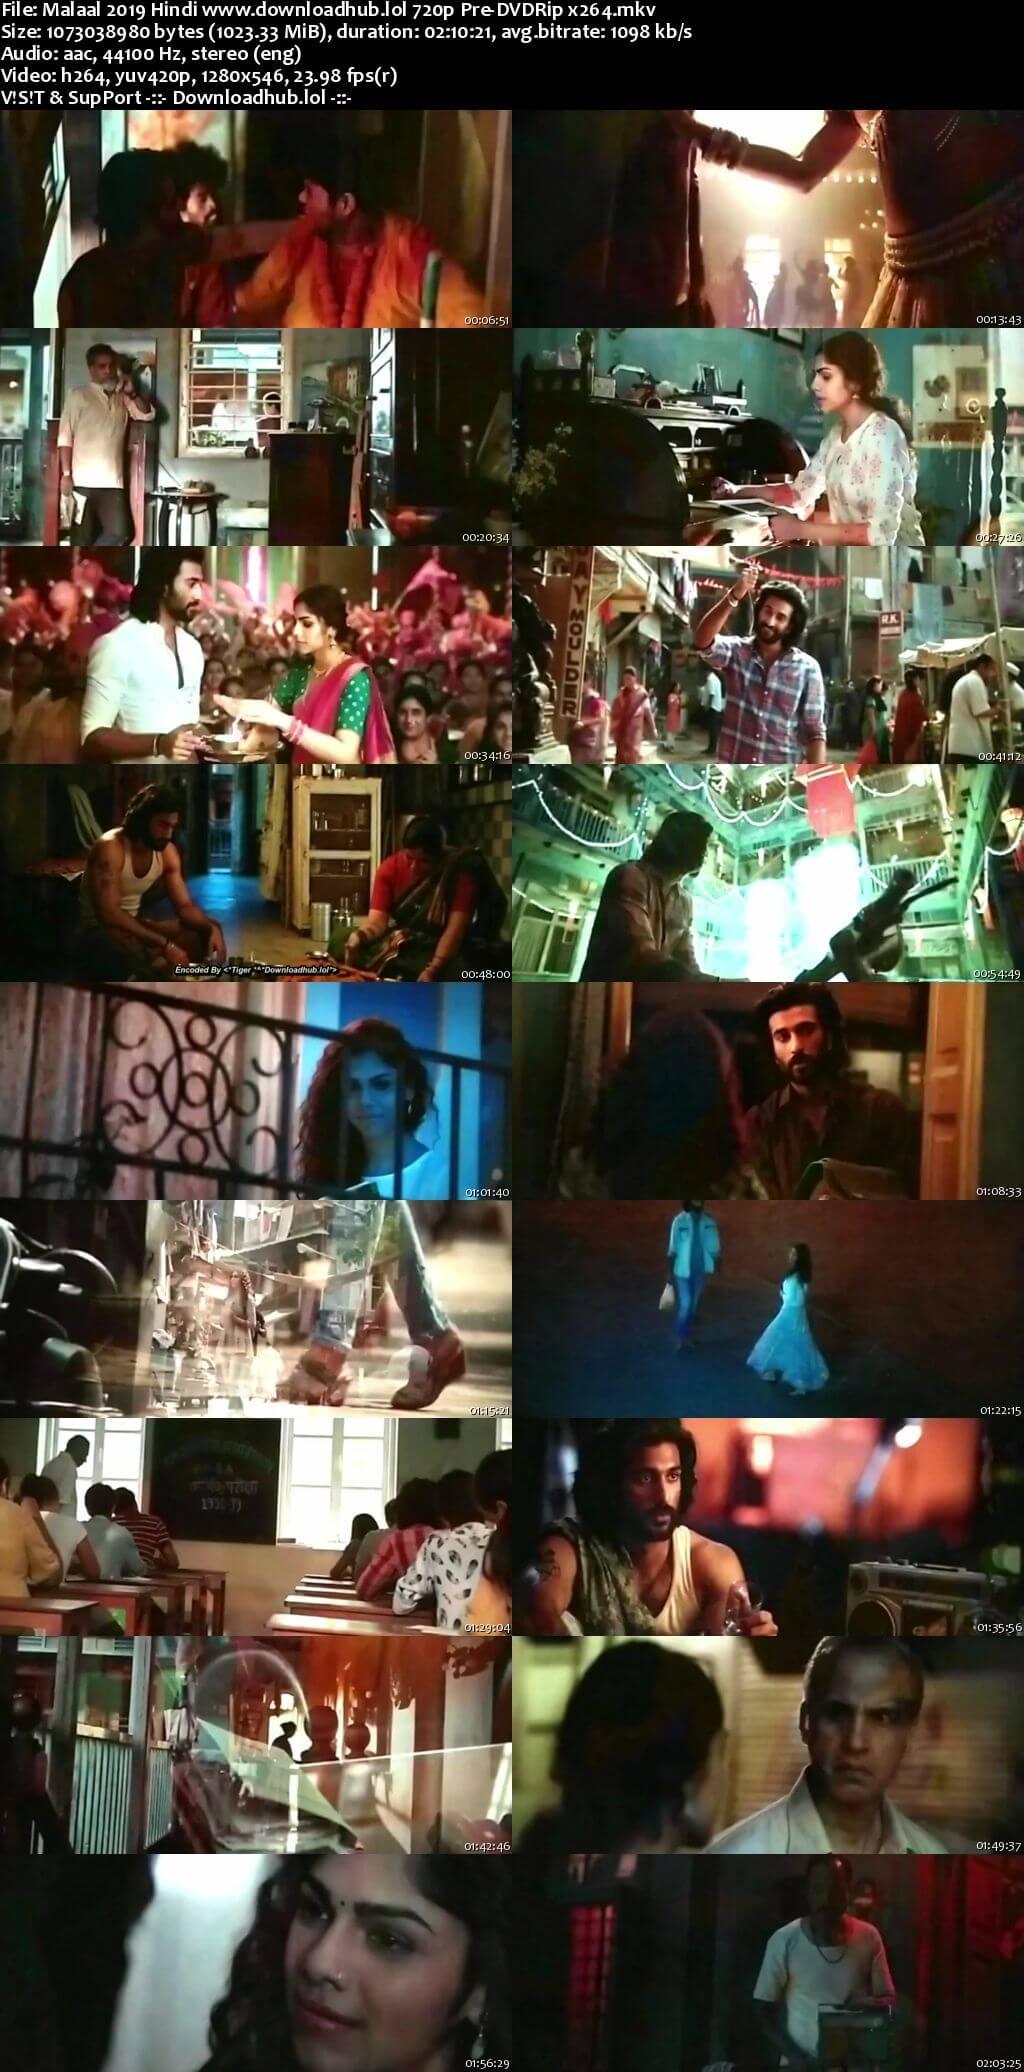 Malaal 2019 Hindi 720p Pre-DVDRip x264